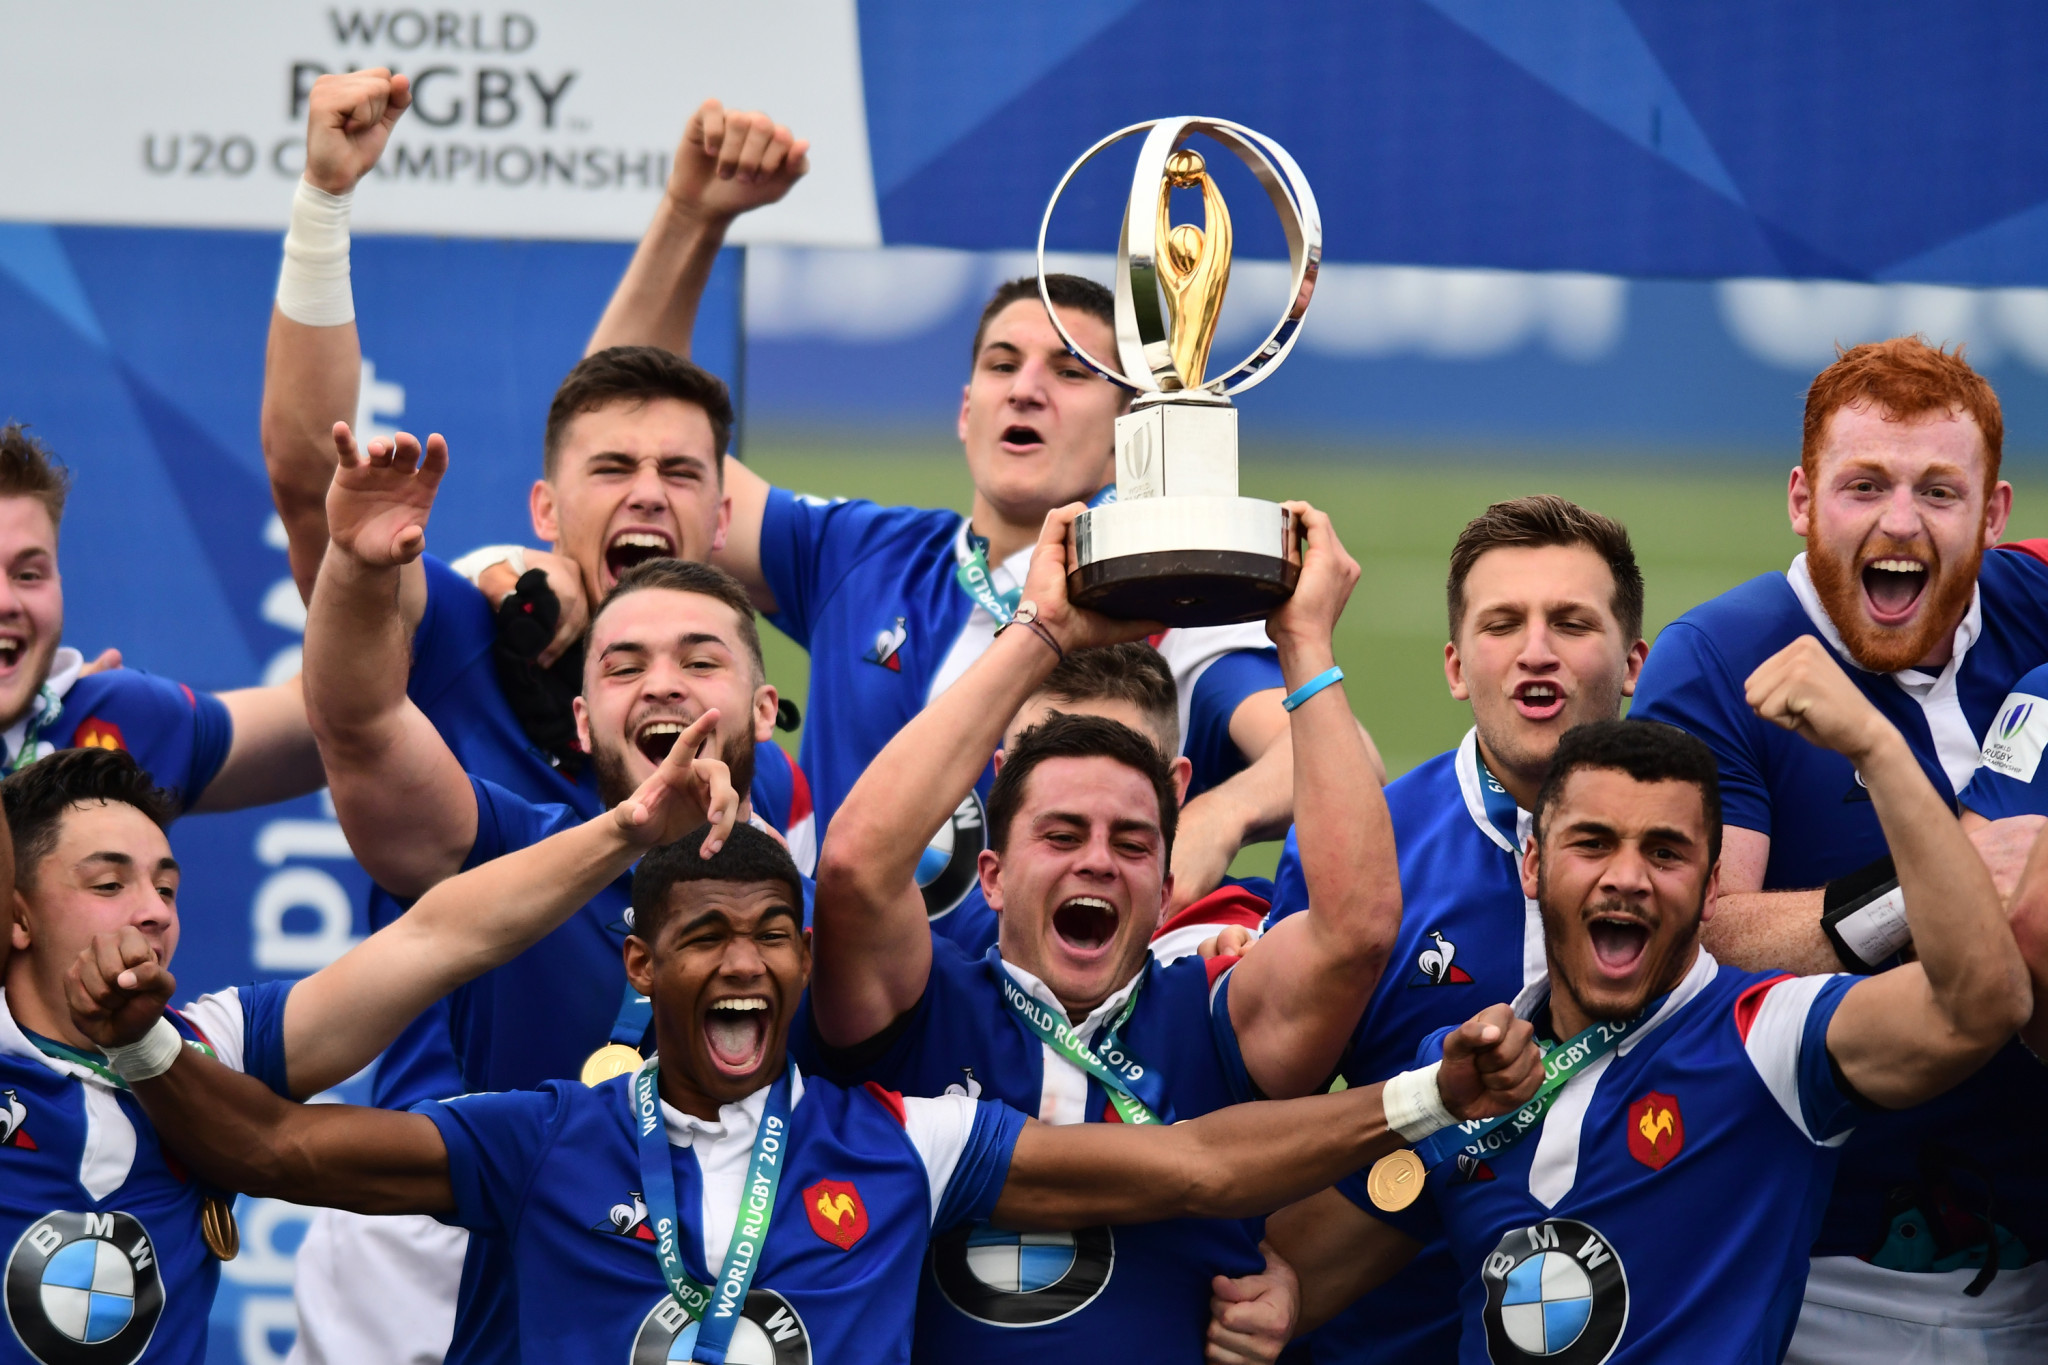 World Rugby cancels Under-20 World Championship